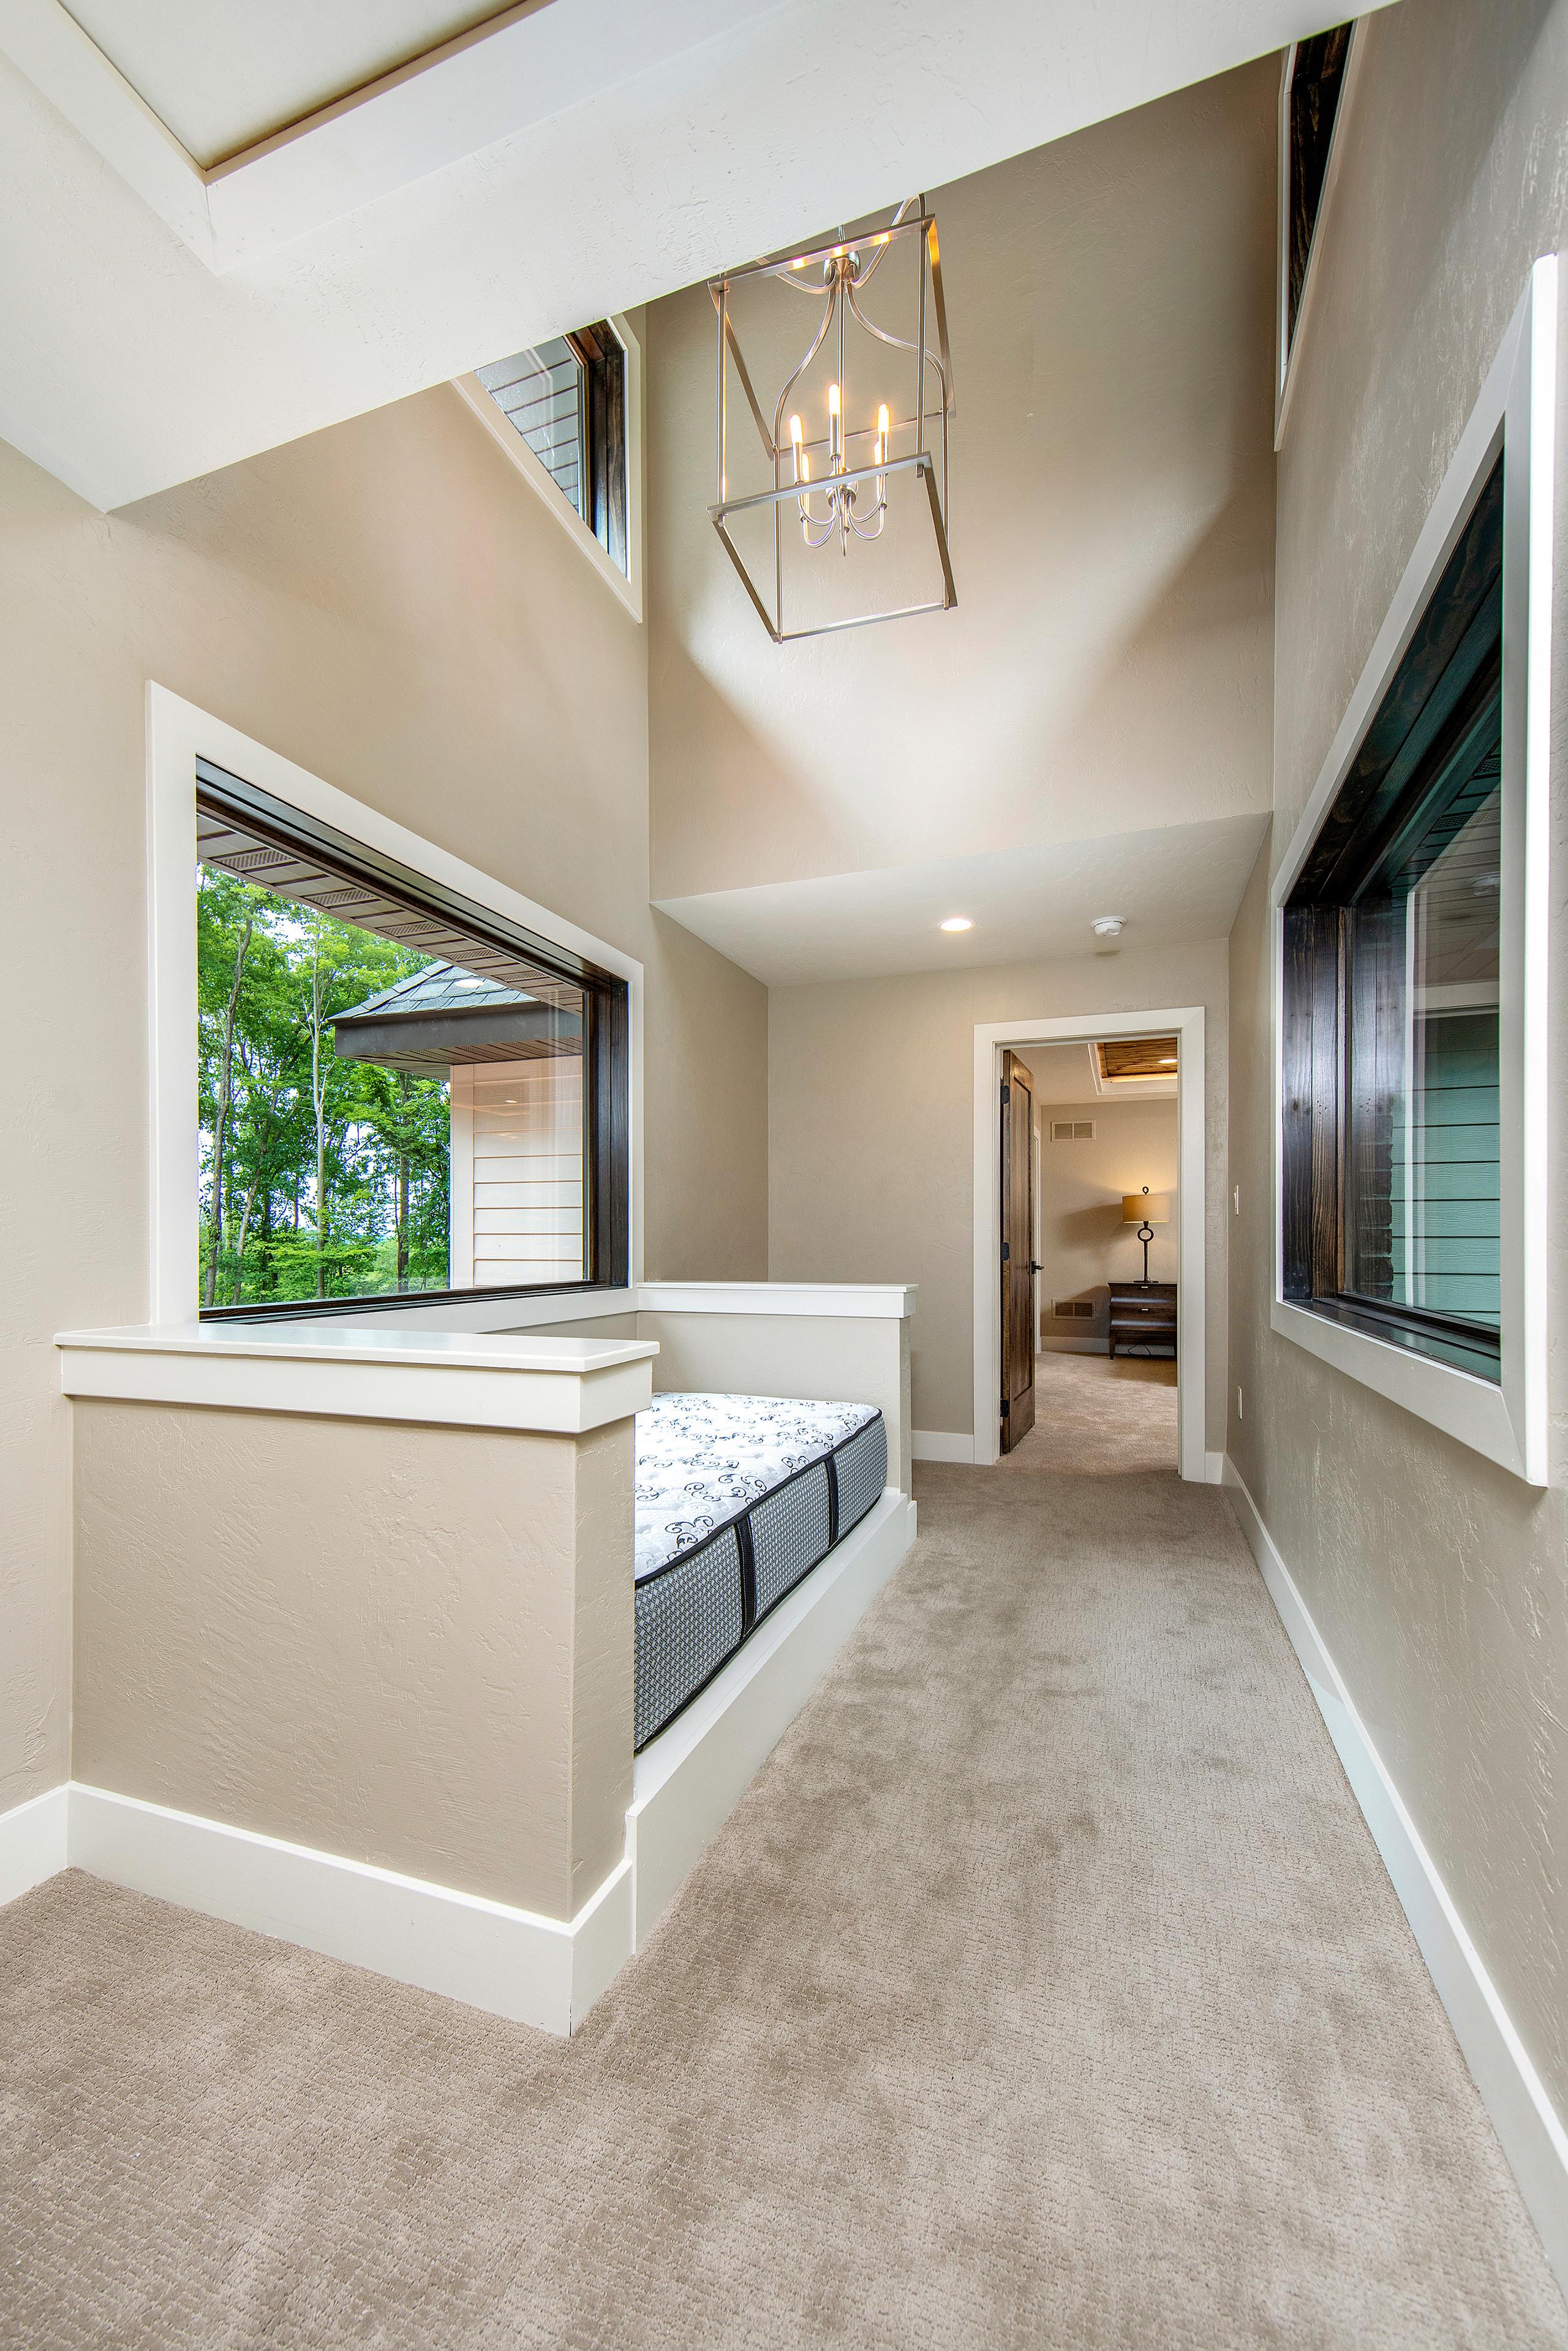 Certified Luxury Builders - Costa Homebuilders - Pittsburgh, PA - Dogwood Estate